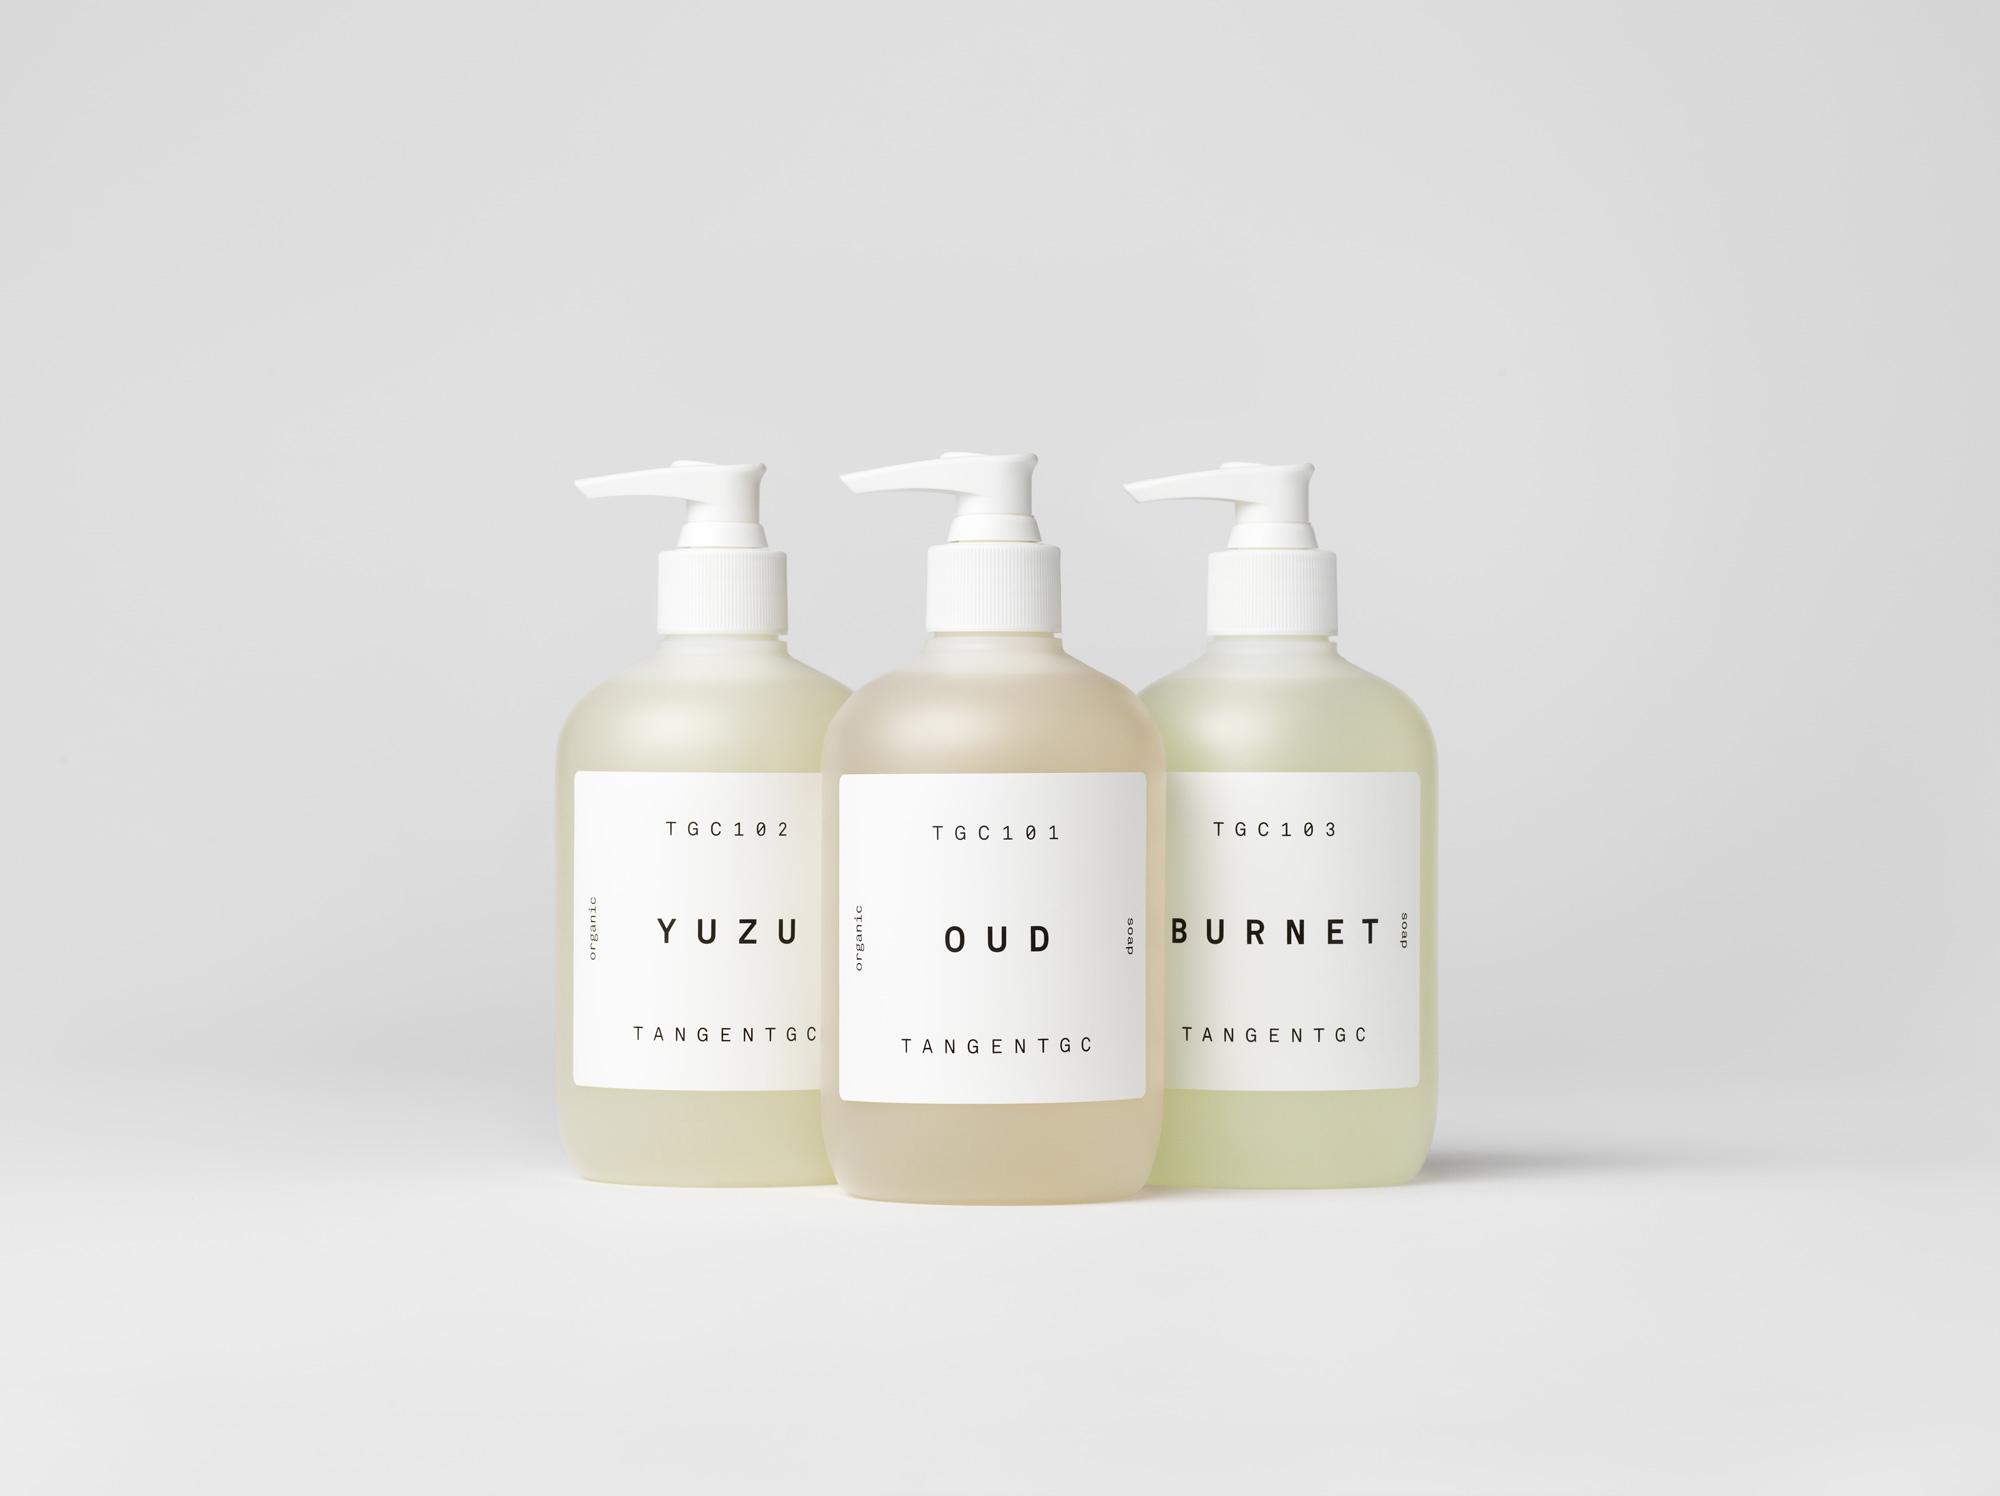 Tangent Gc Organic Soaps The Dieline Branding